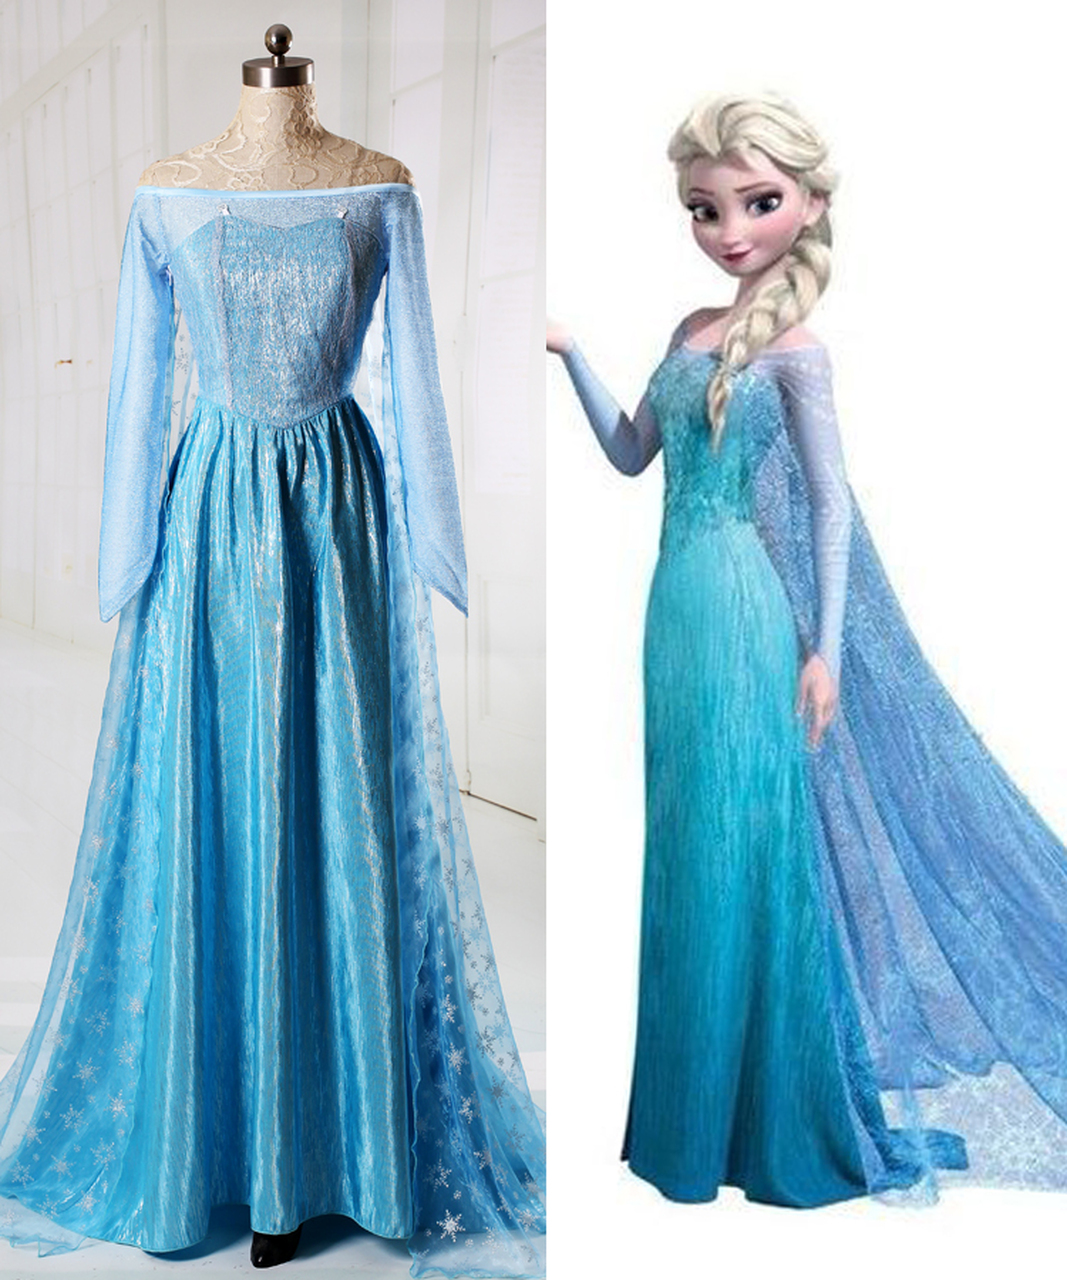 sc 1 st  Fanplusfriend Cosplay & Disney Frozen ( Movie) Cosplay Elsa Costume Adult Women Outfit